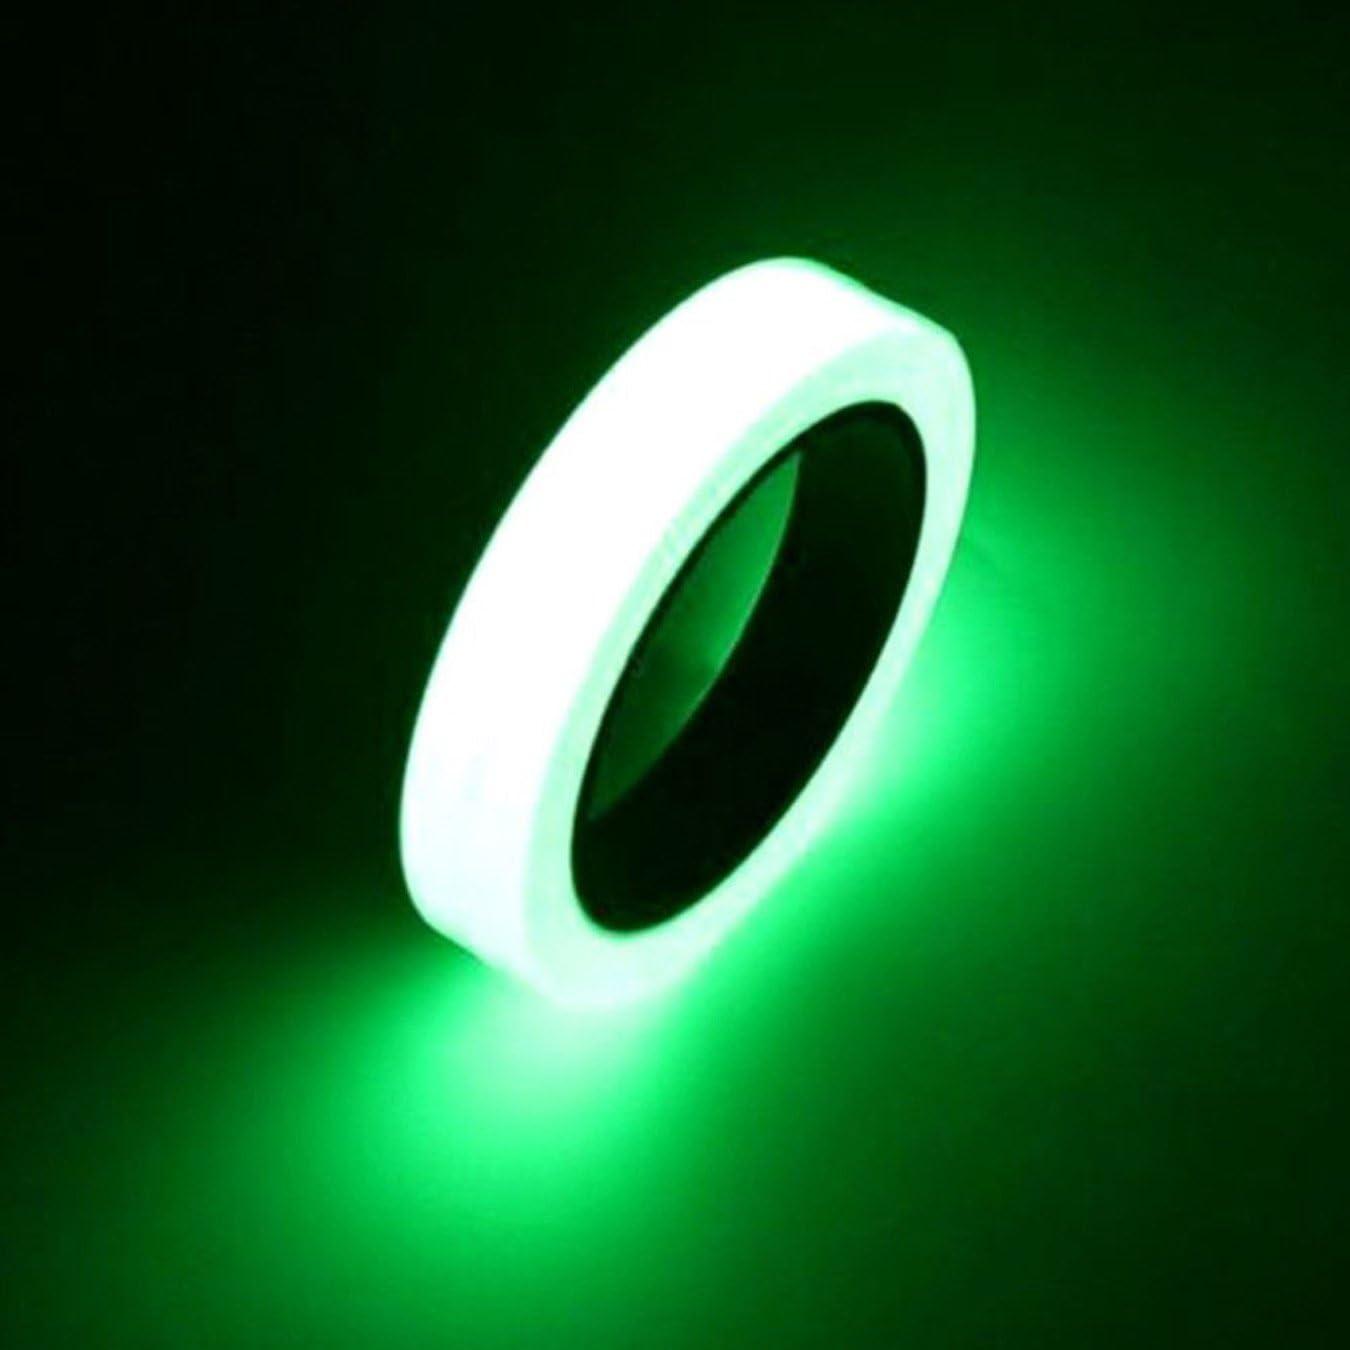 18mm*3m UOOOM Glow in the Dark Luminescentes Tapes Autocollant S/écurit/é Fluorescentes Bandes Phosphorescent Ruban